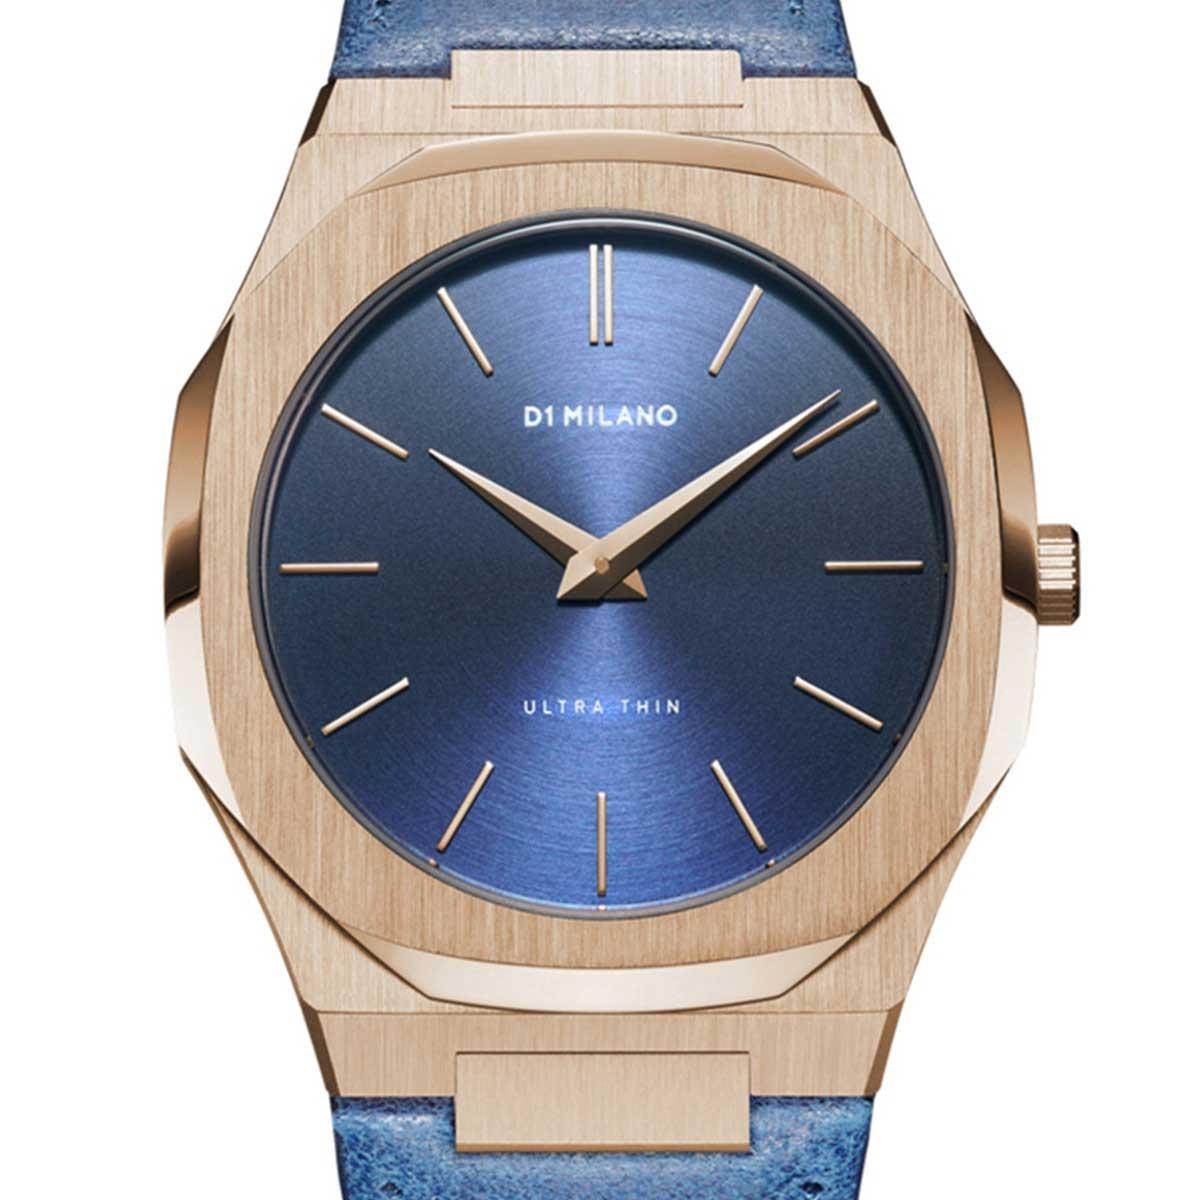 D1 MILANO ディーワンミラノ 電池式クォーツ 腕時計 [UTLJ04] 並行輸入品